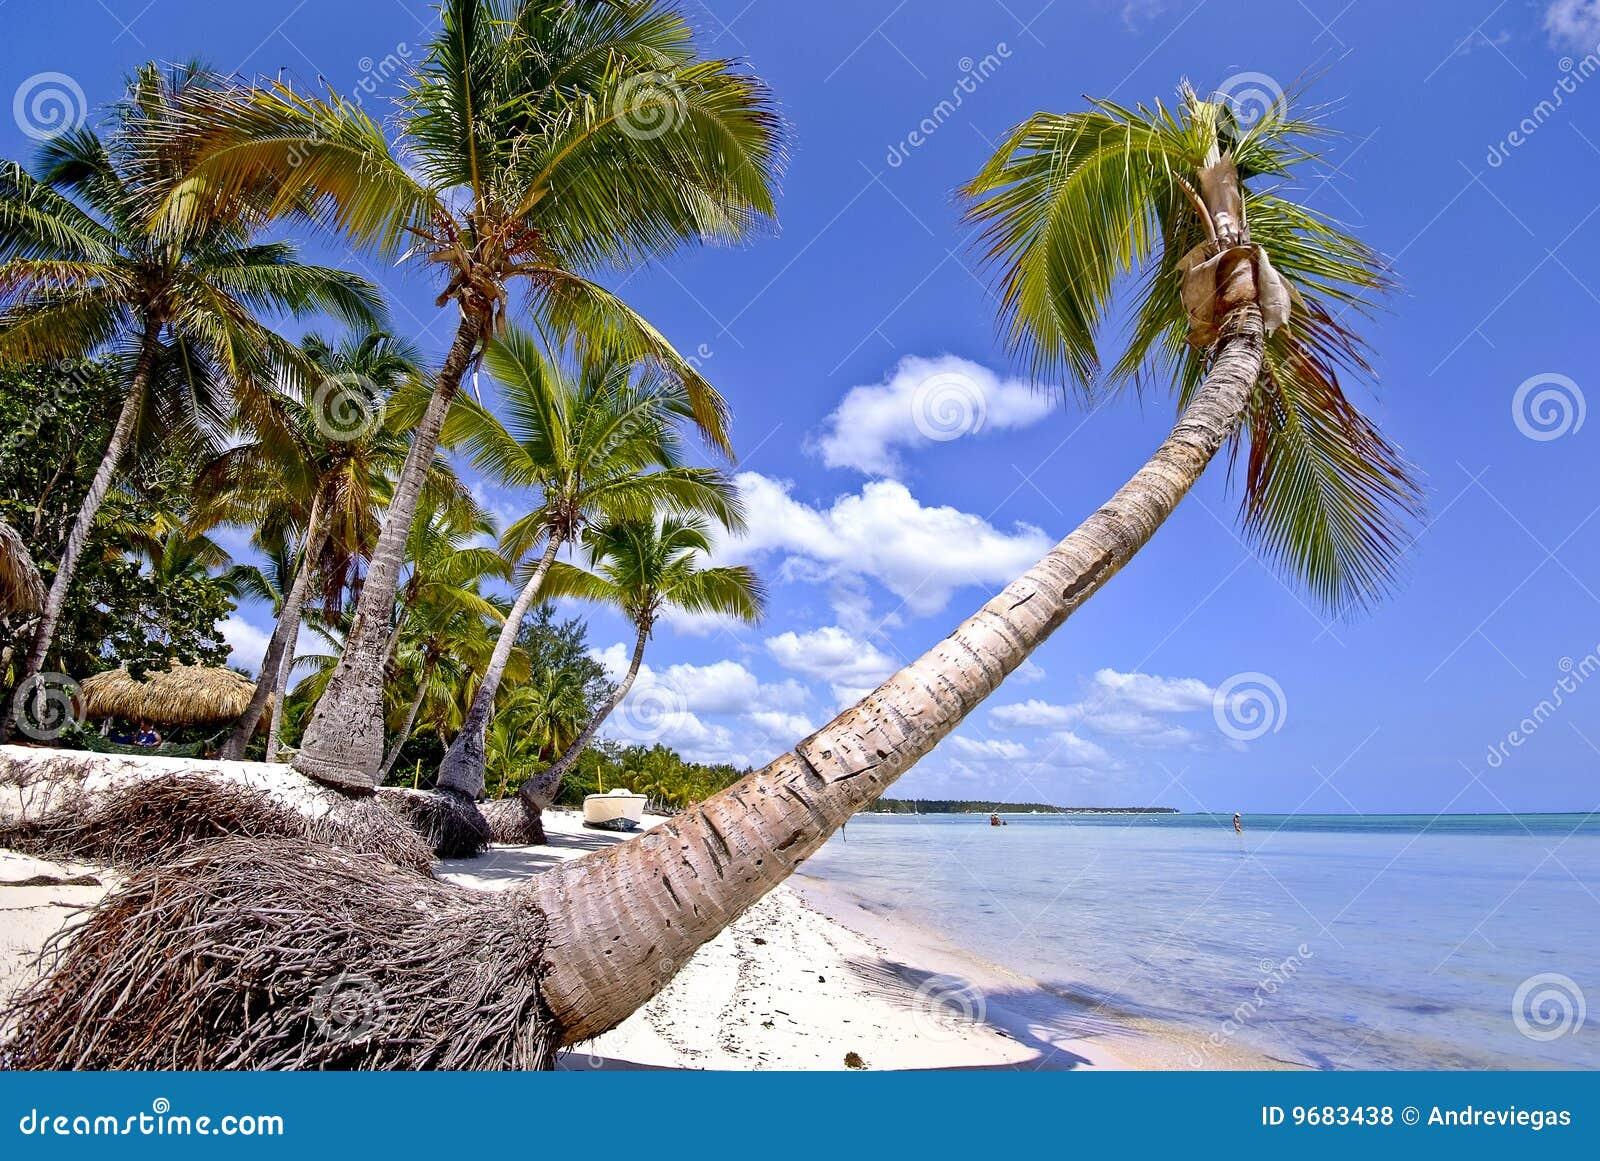 punta cana dominican republic stock photo image 9683438. Black Bedroom Furniture Sets. Home Design Ideas